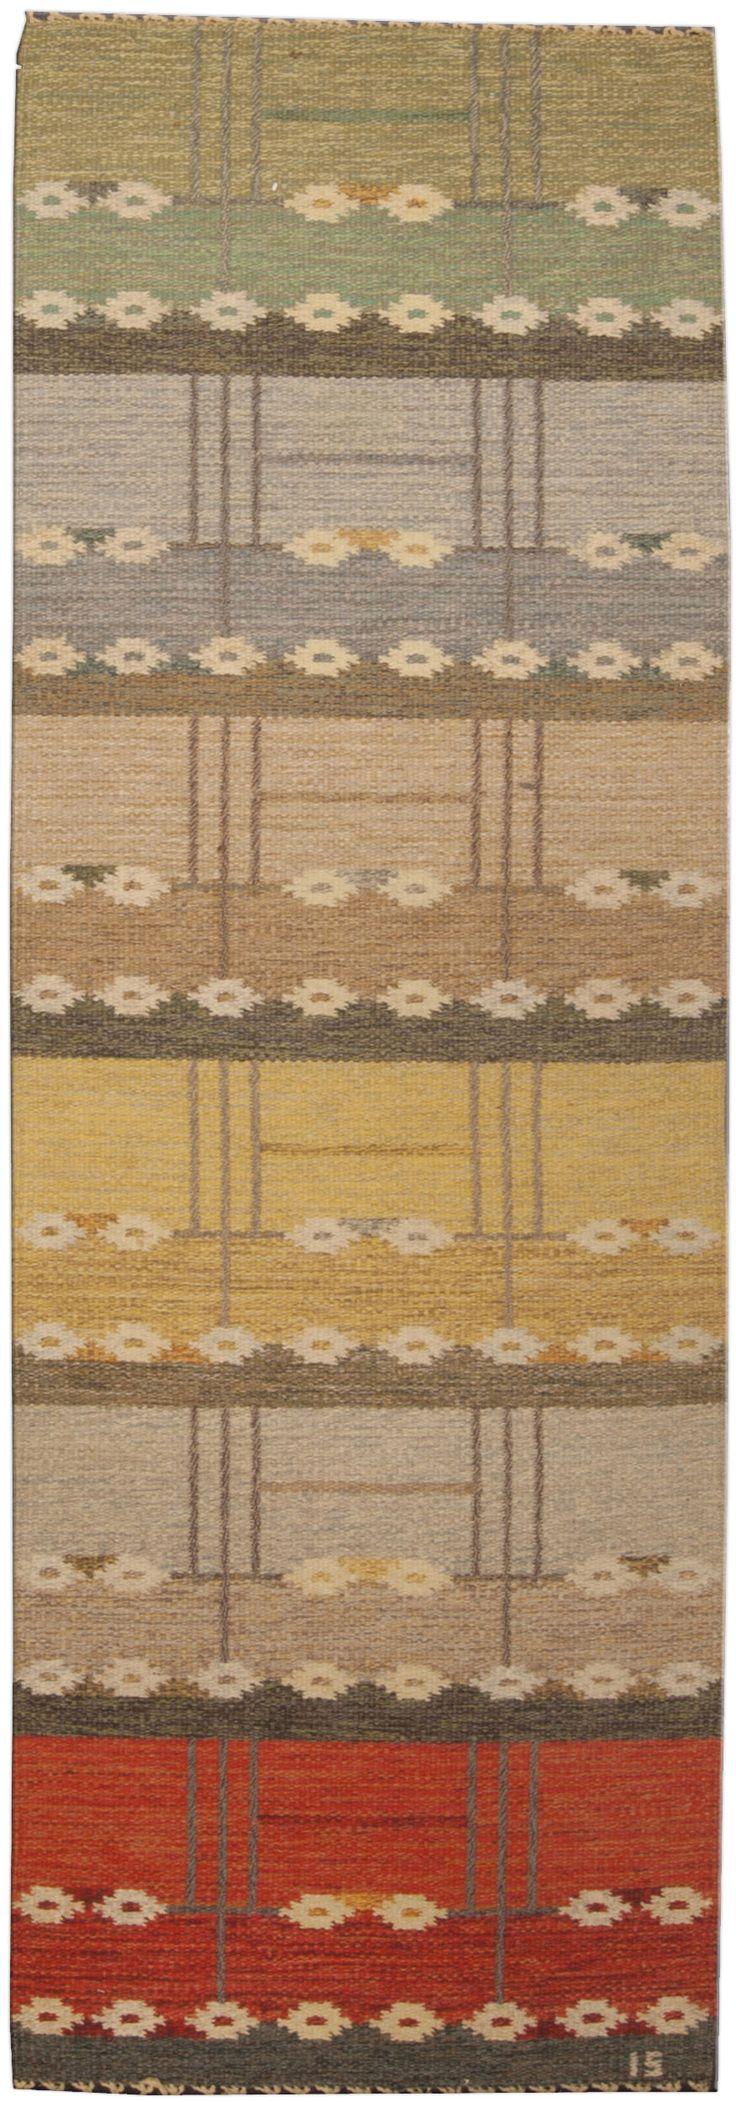 Scandinavian Rugs, Swedish Rugs: Swedish rug, Scandinavian Rug (vintage) for Scandinavian interior decor